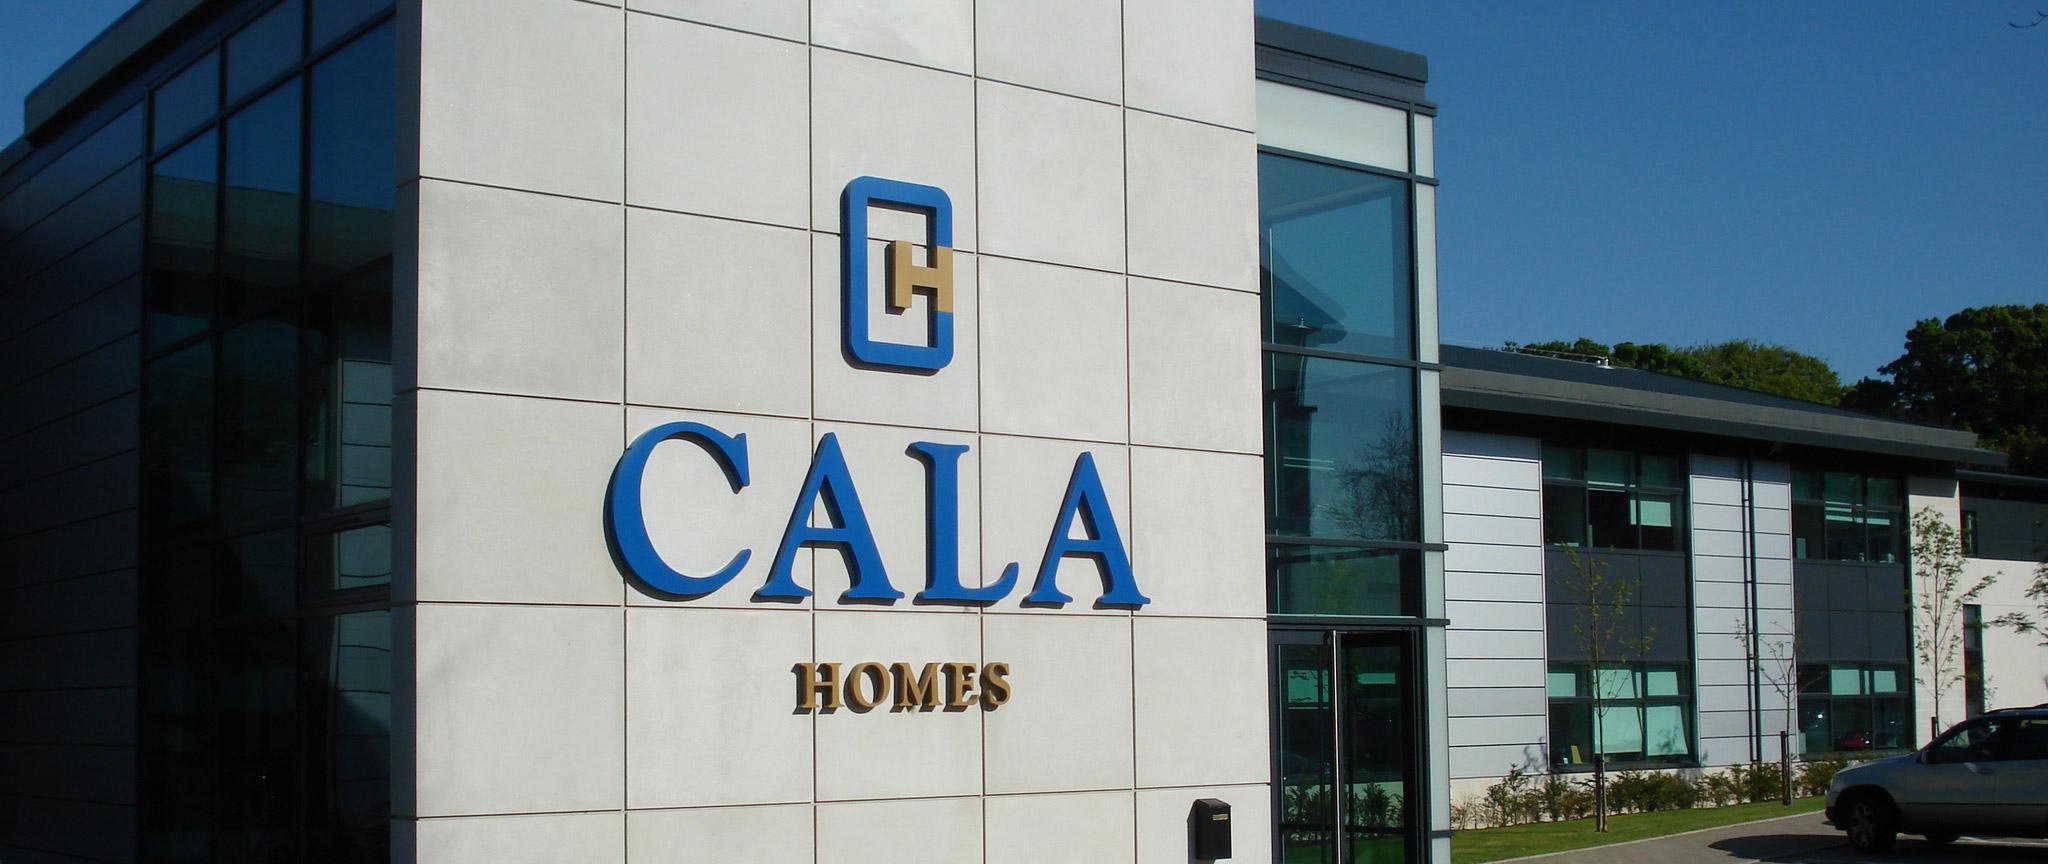 Gala homes image